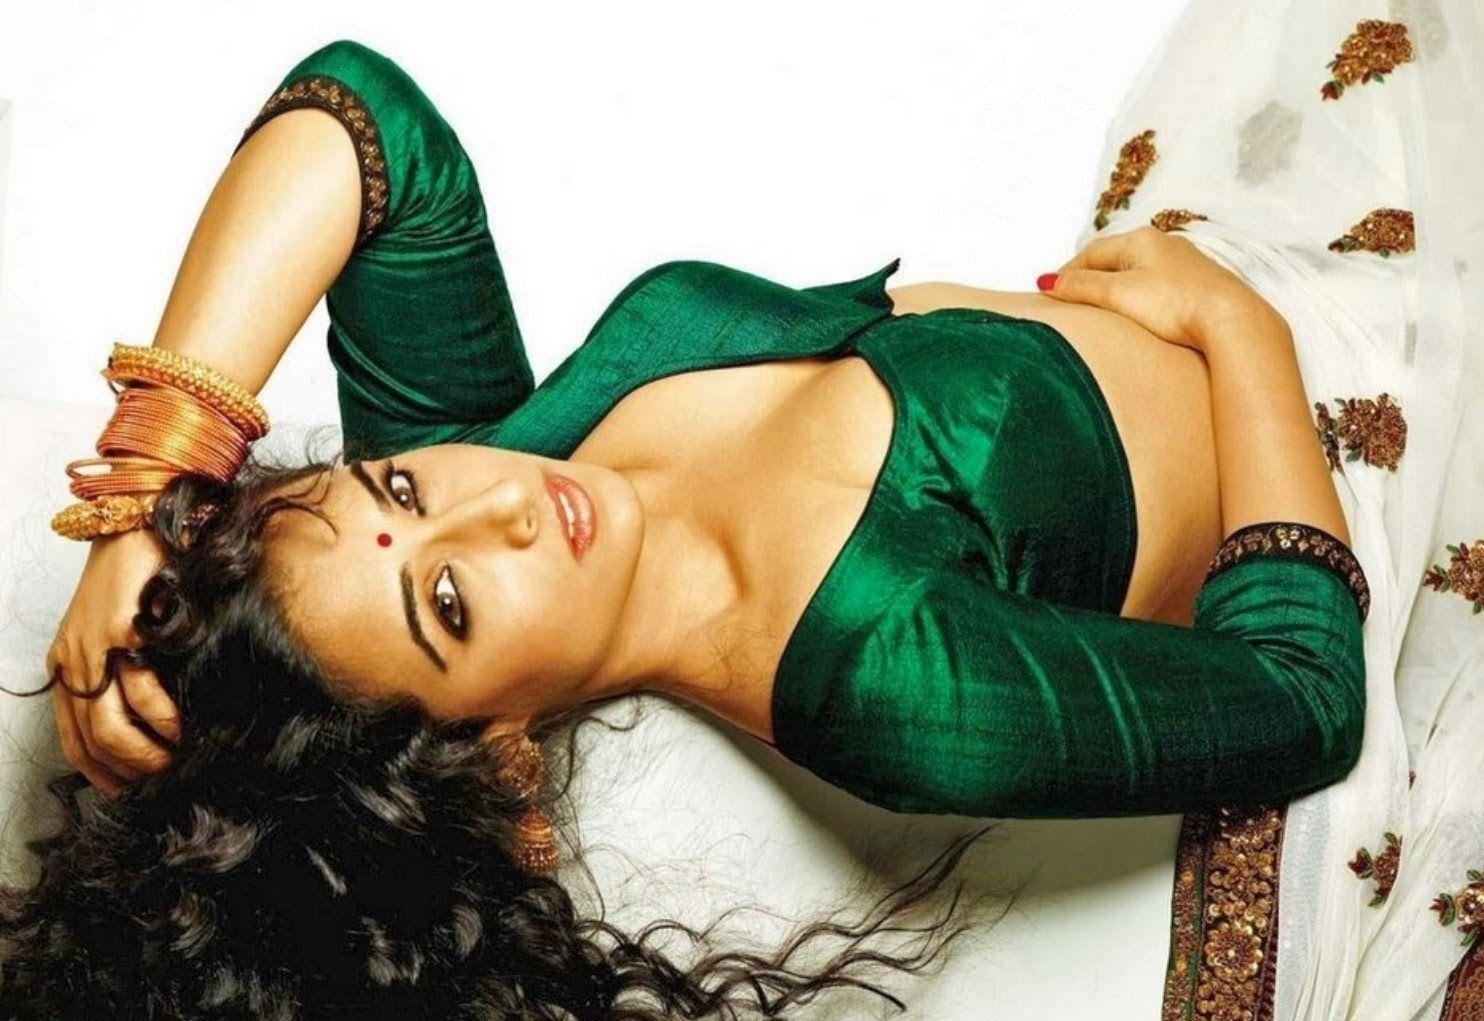 Vidya Balan Lying In Bed Hot Saree Foundpix Vidyabalan  -2559